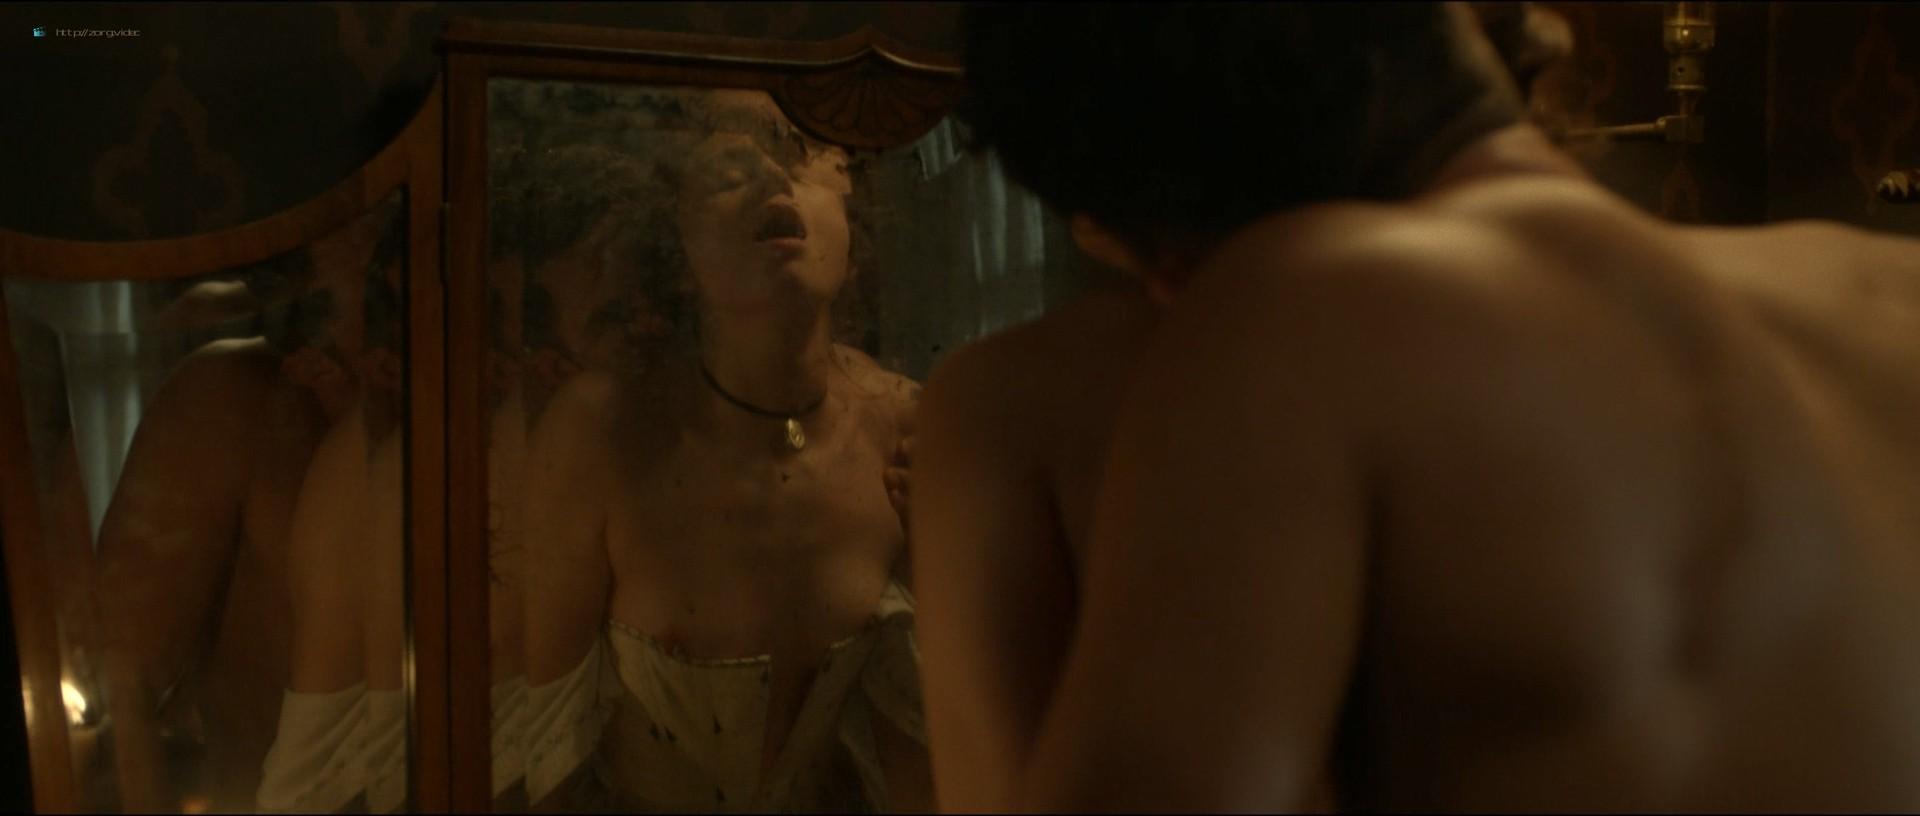 Maeve Dermody nude sex Karla Crome nude too - Carnival Row (2019) s1e1 HD 1080p (13)